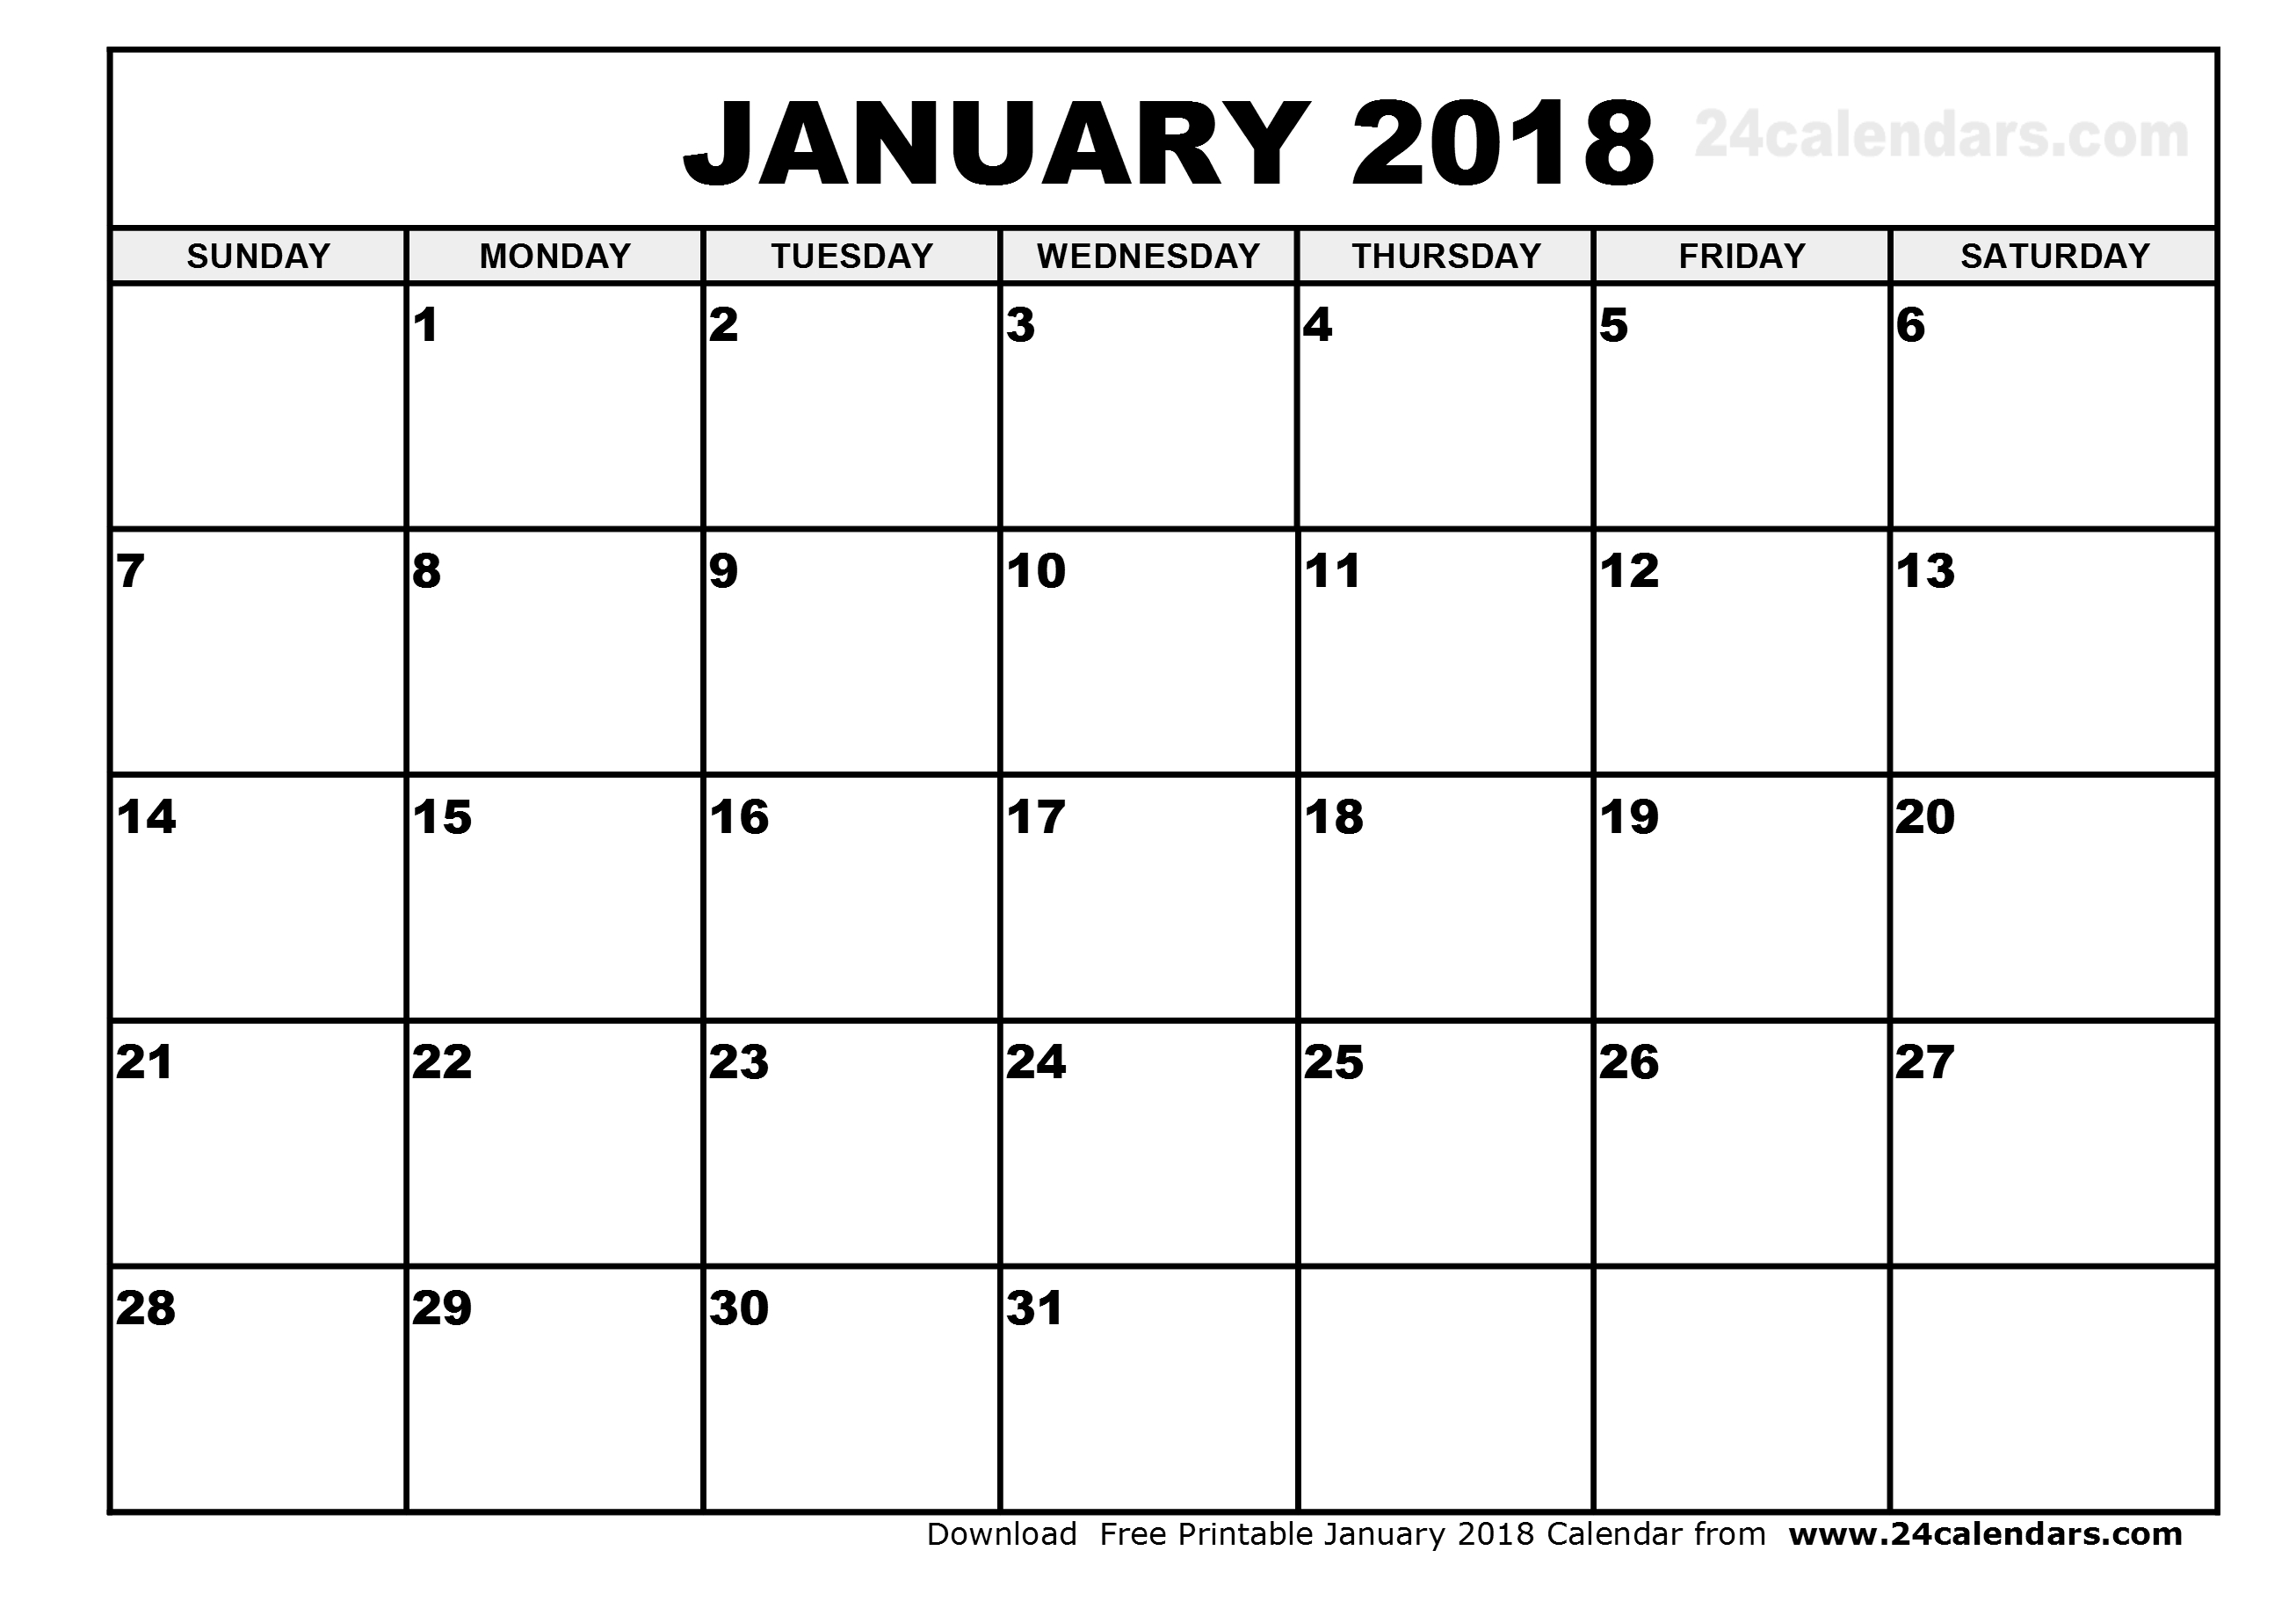 April 1985 Calendar Holidays